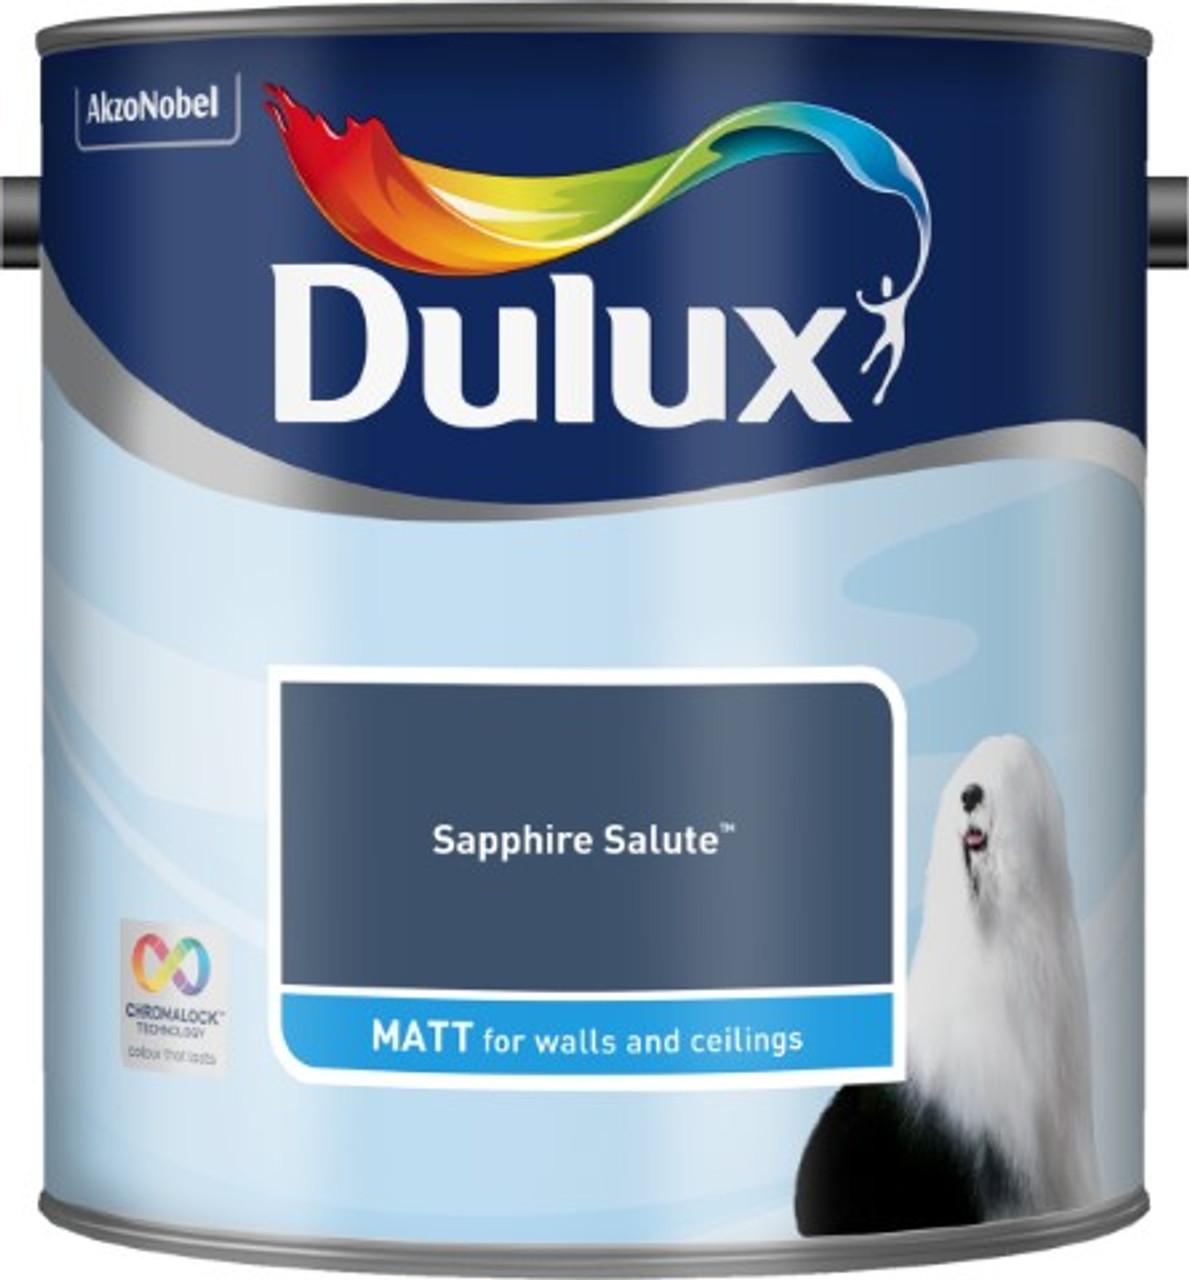 2.5L Dulux Matt Emulsion Sapphire Salute